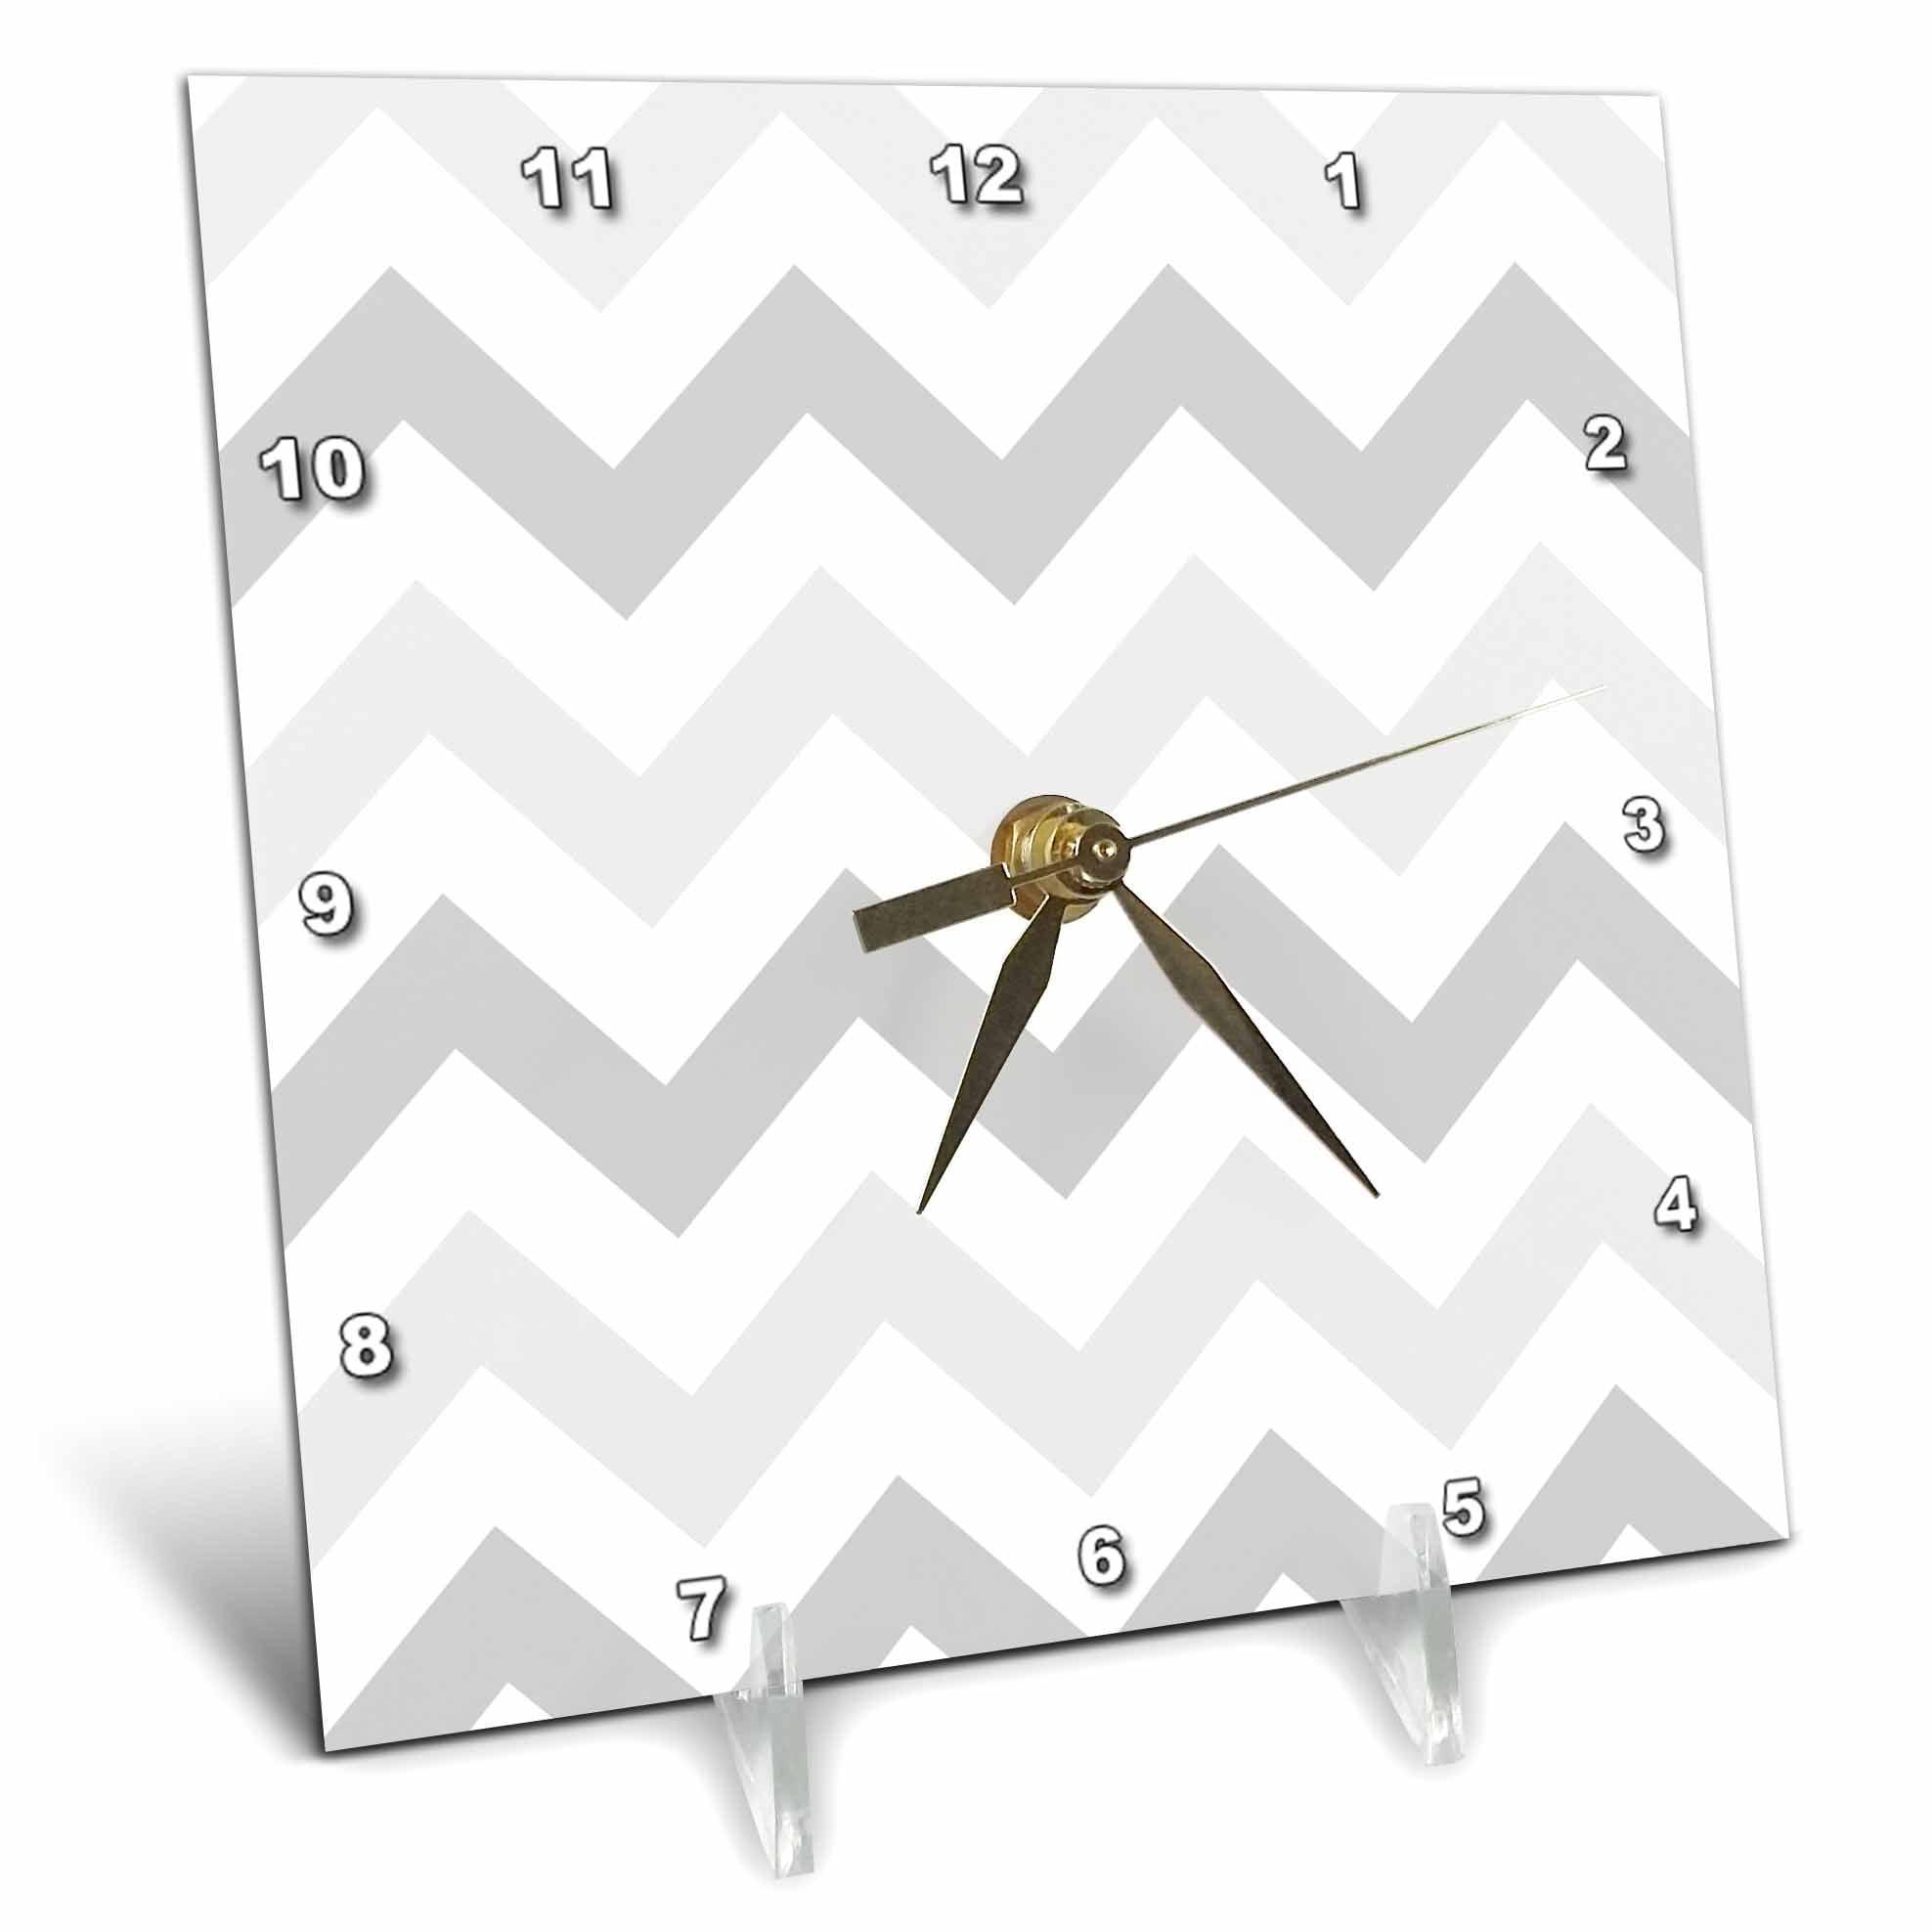 3dRose Light shades of Grey Chevron zig zag pattern pastel gray zigzags, Desk Clock, 6 by 6-inch by 3dRose